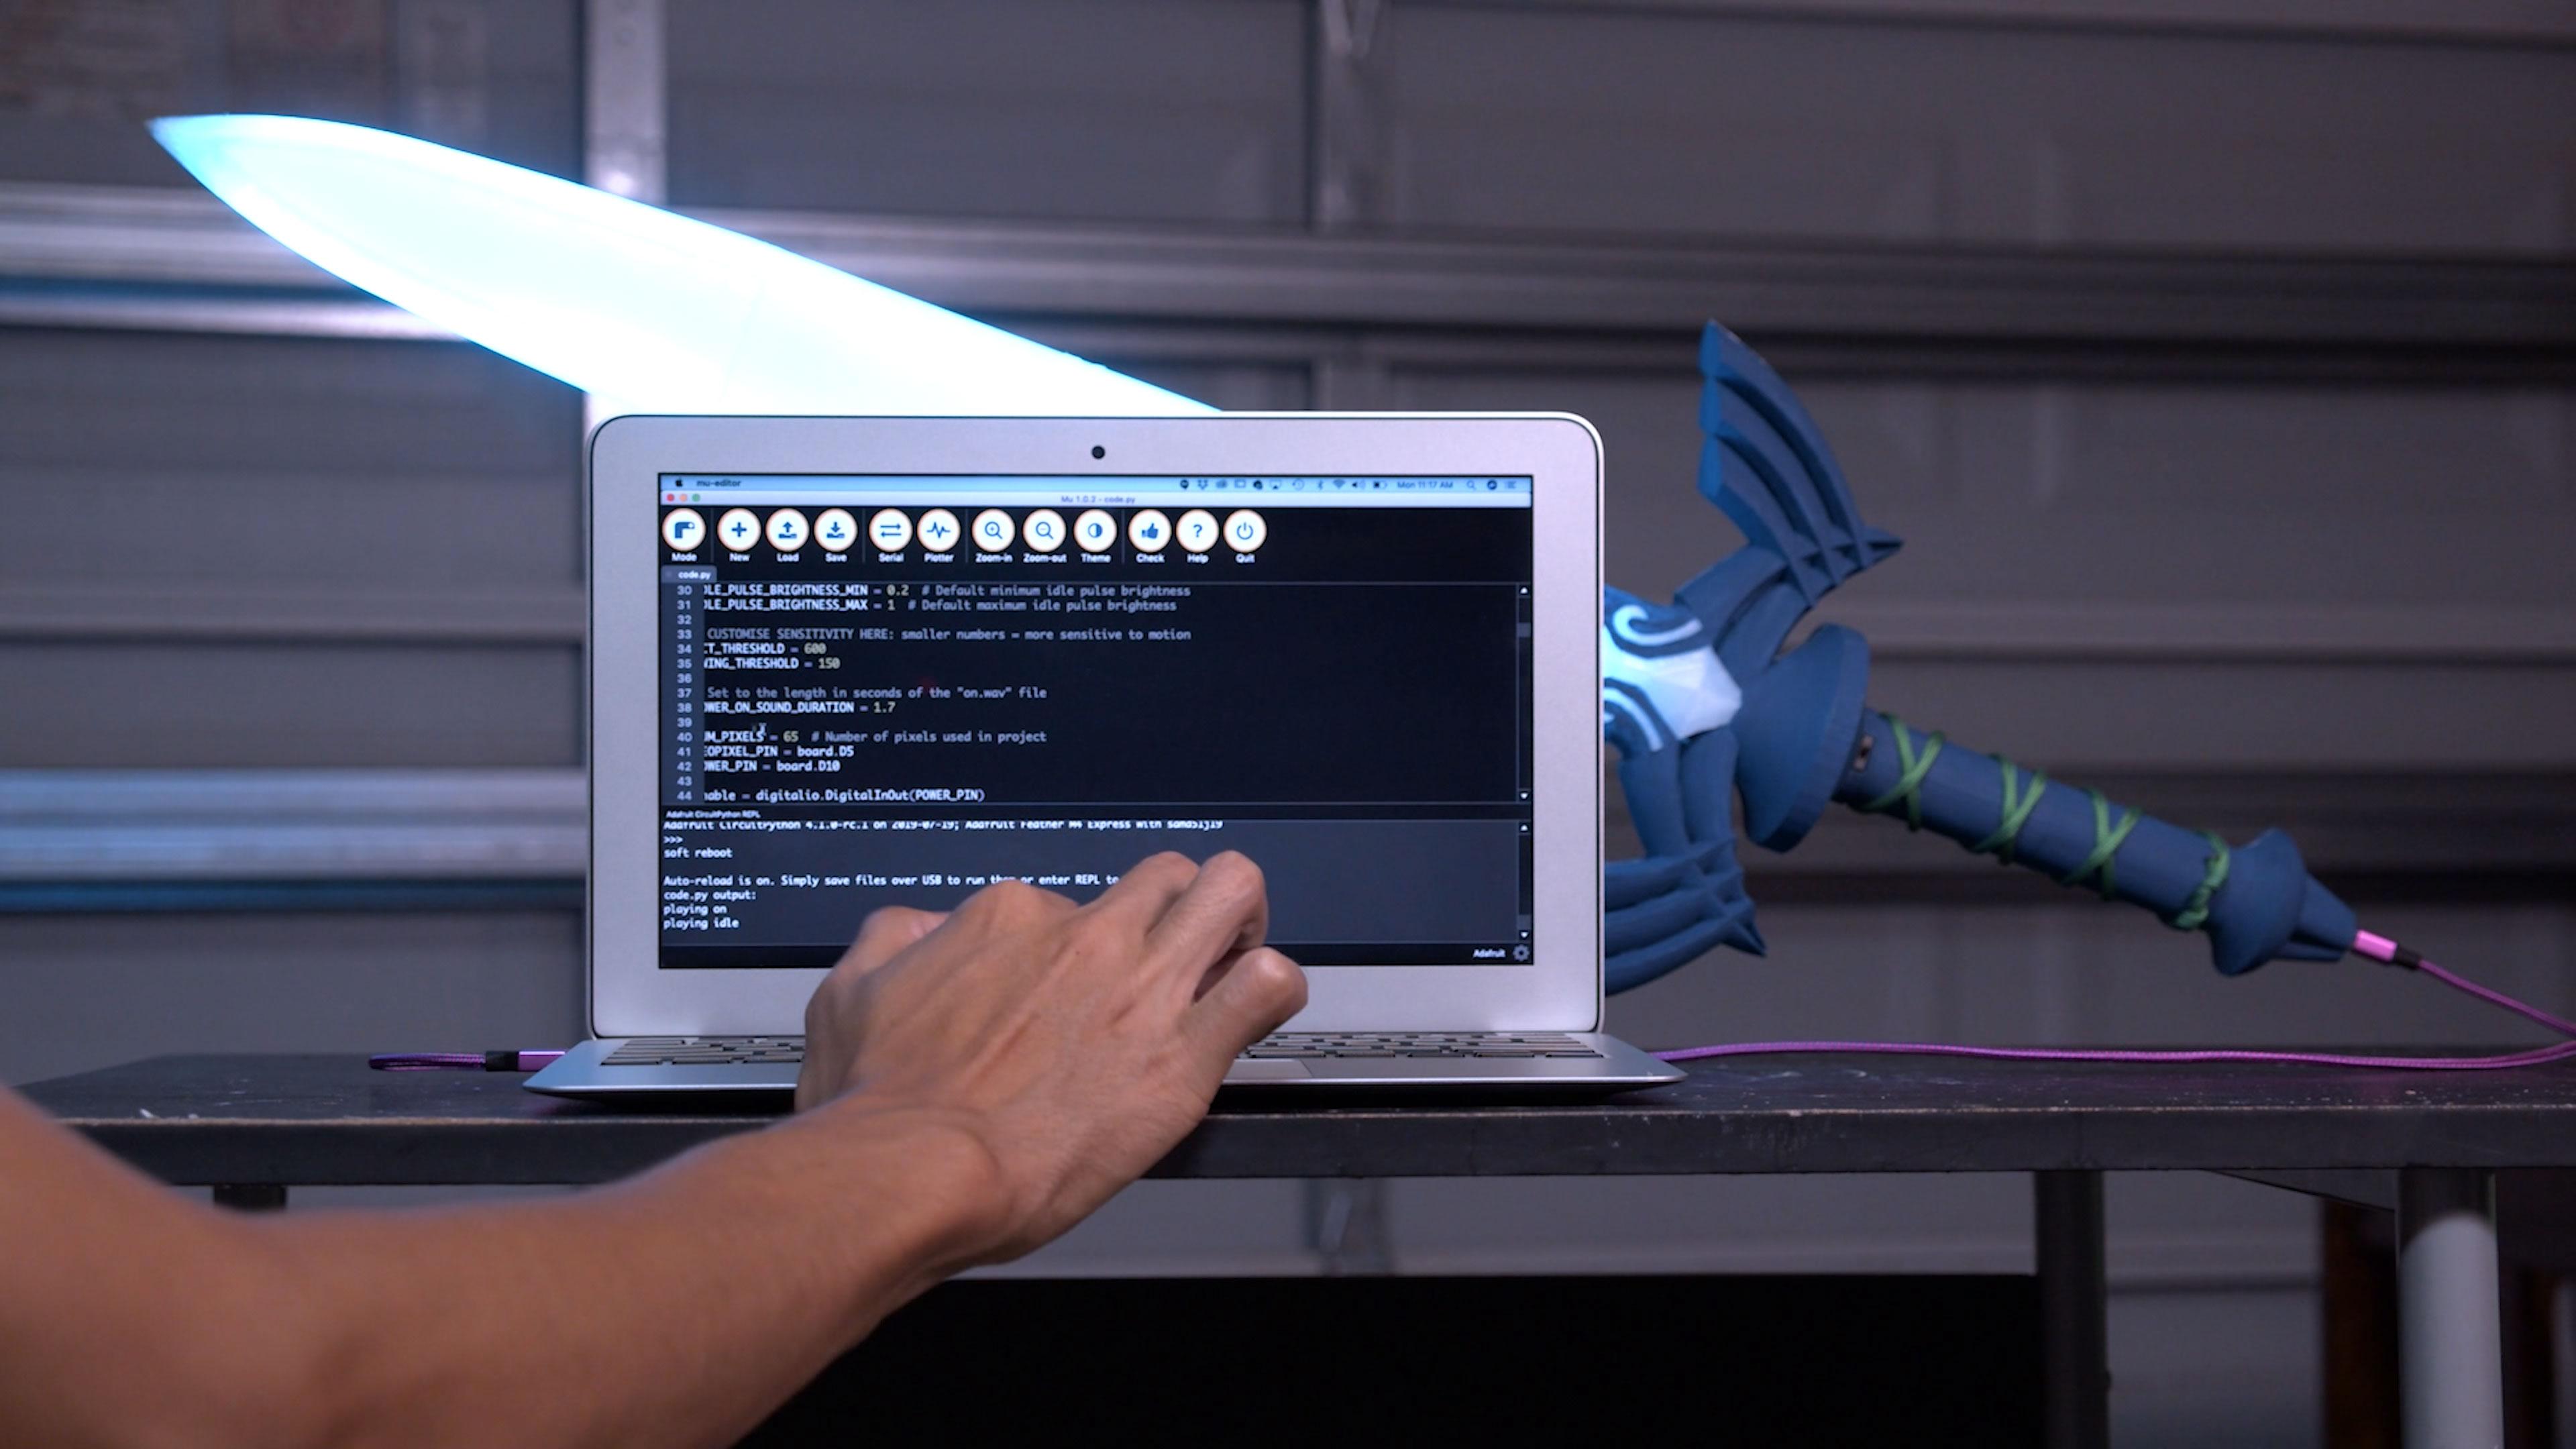 3d_printing_swordcode.jpg